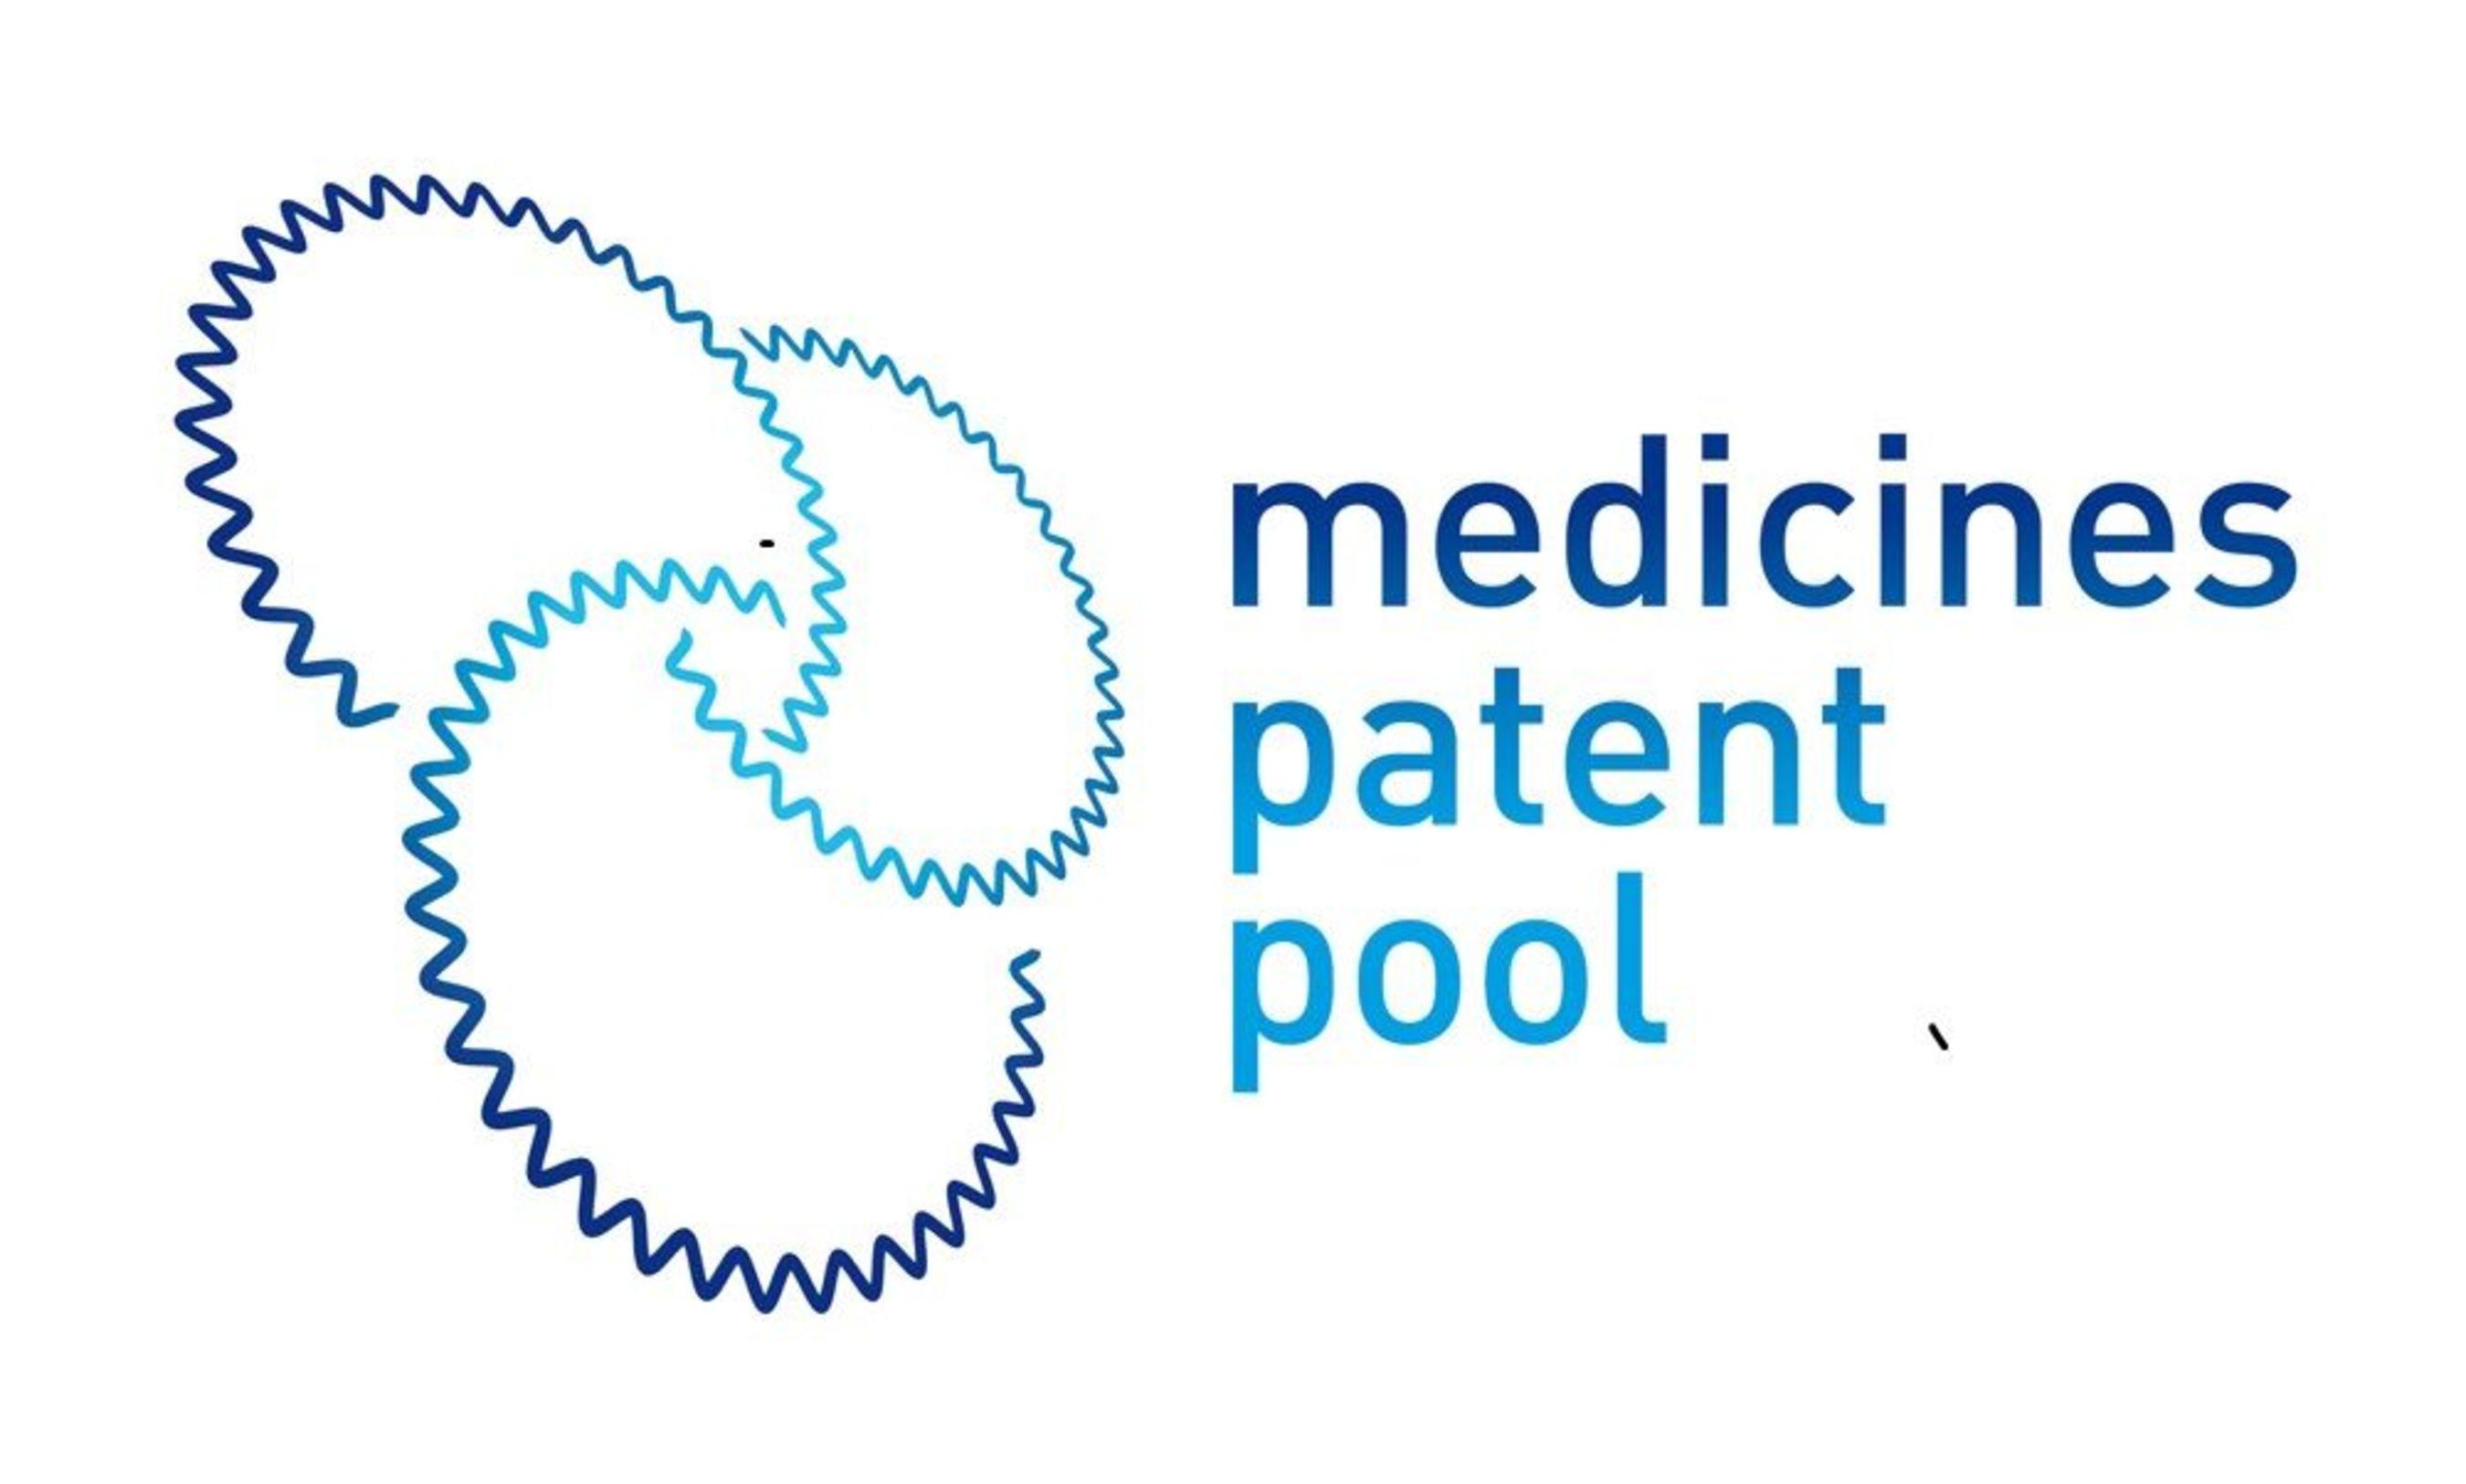 Medicines Patent Pool Logo (PRNewsFoto/Medicines Patent Pool) (PRNewsFoto/Medicines Patent Pool)